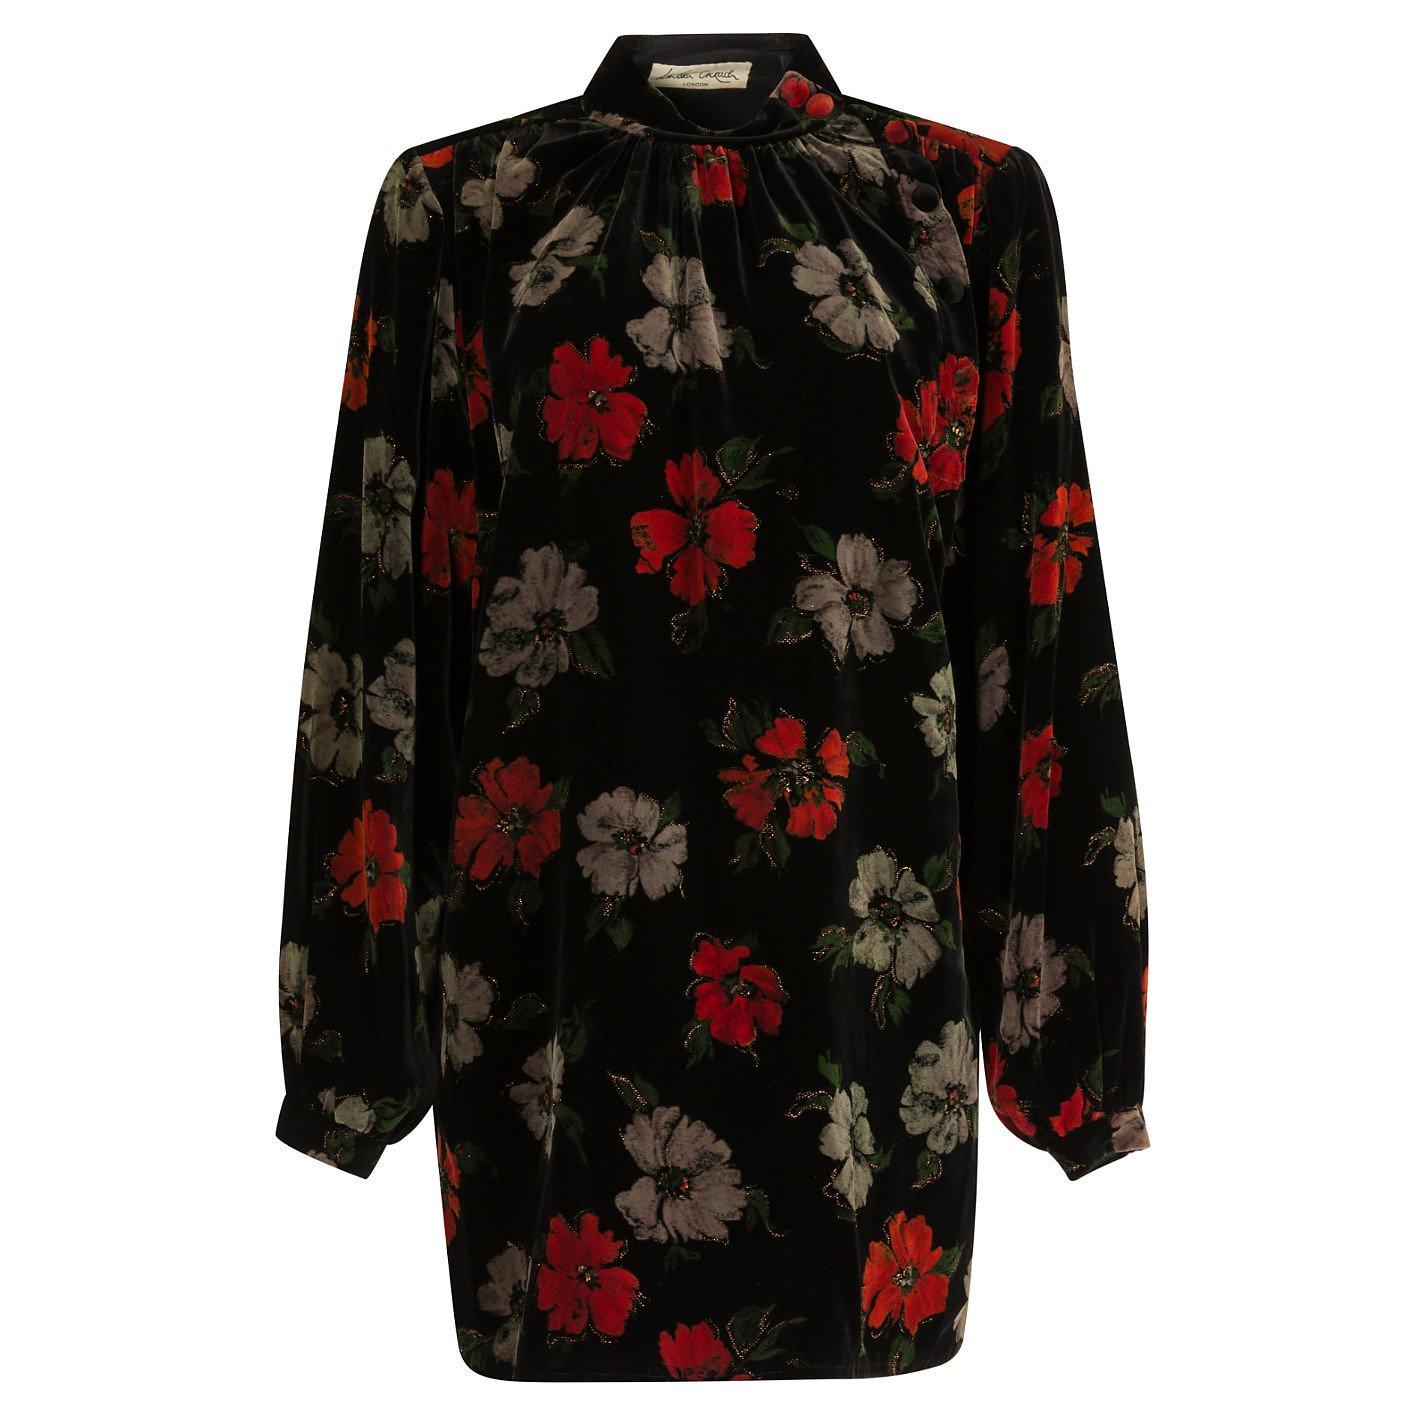 Lindka Cierach Floral Velvet Tunic Dress